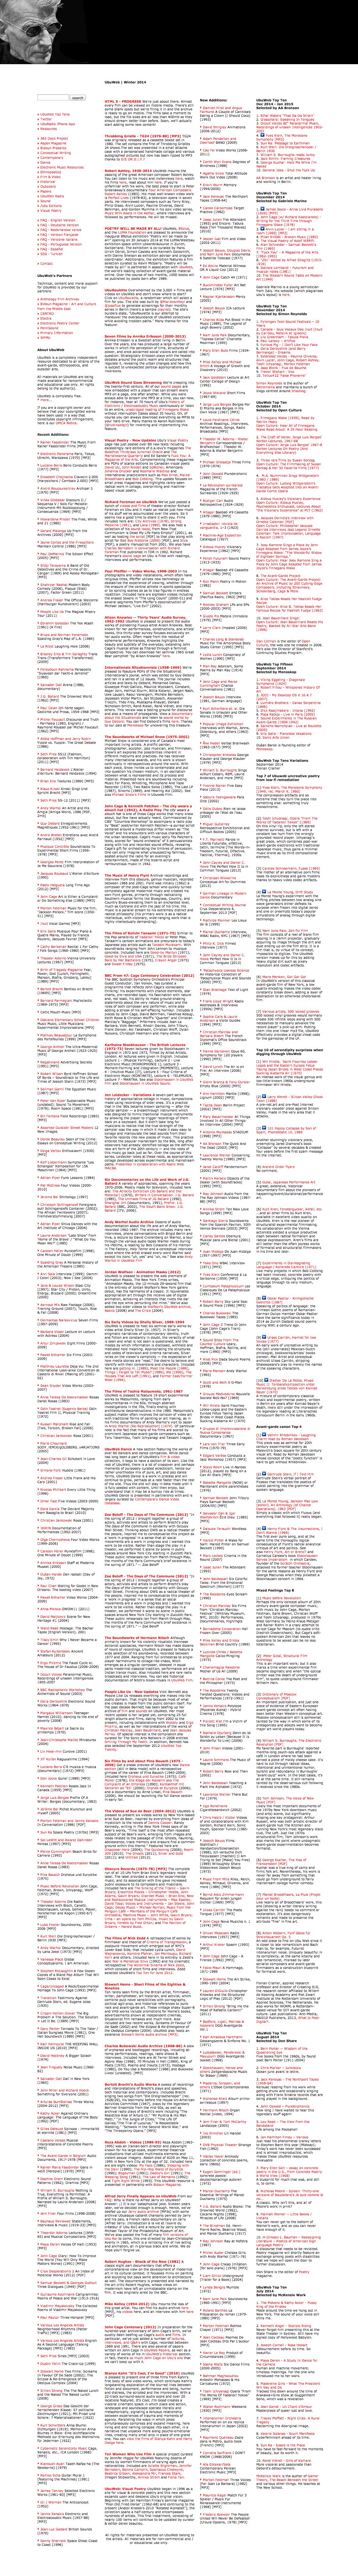 UbuWeb homepage screenshot, ca. 2013.